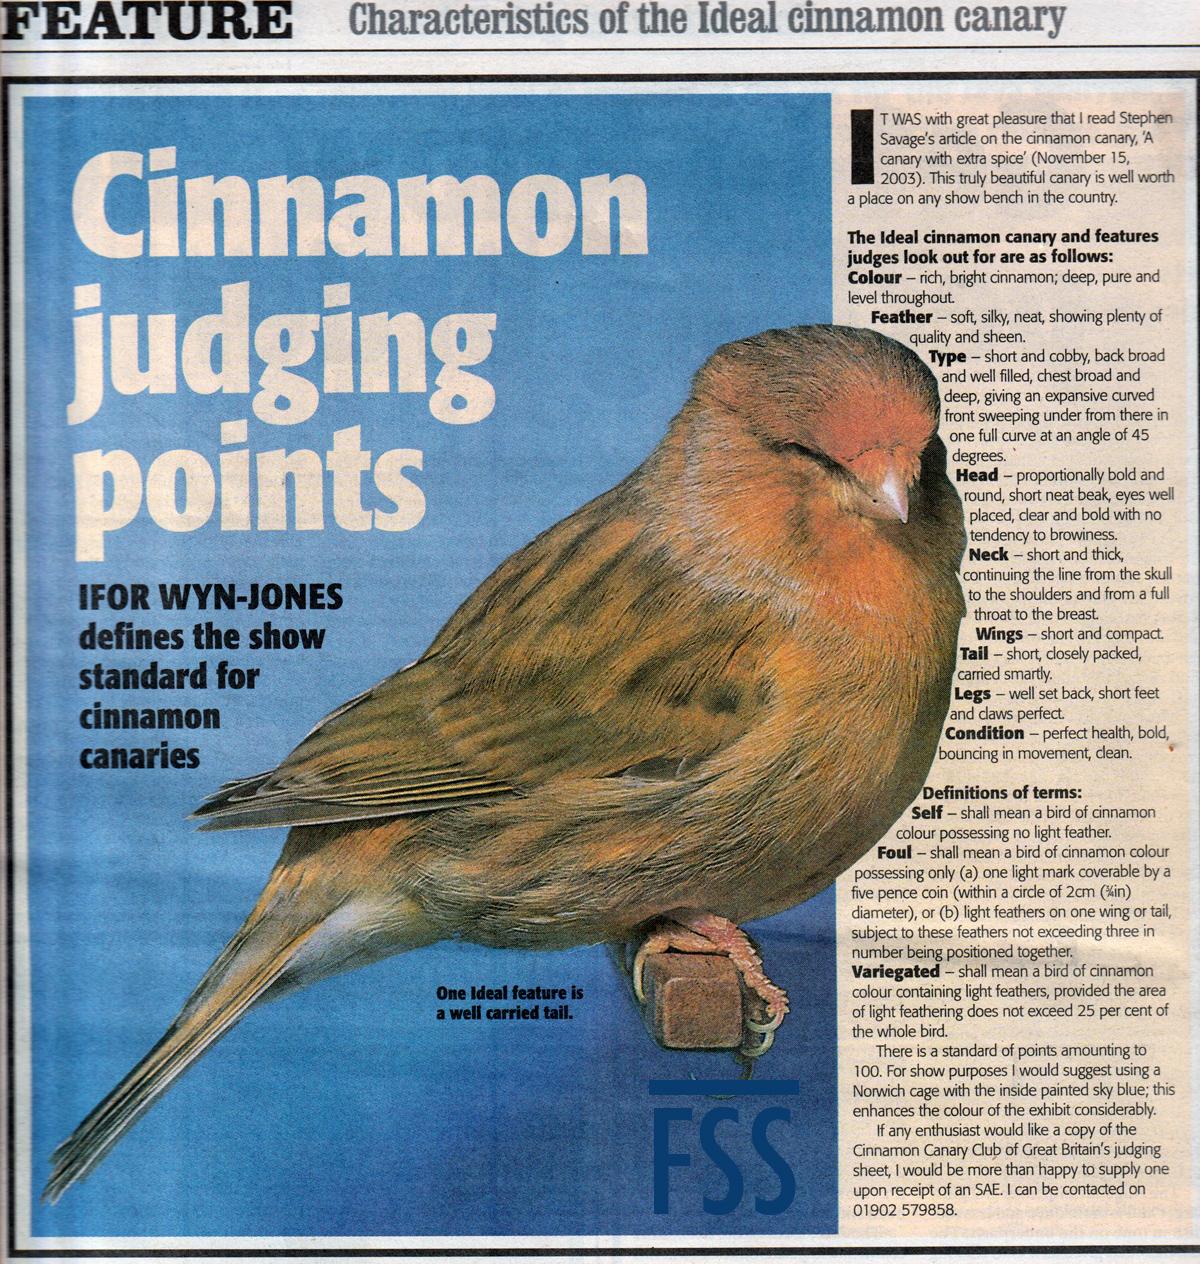 C&AB 2004.02.07 Cinnamon standard-FSS